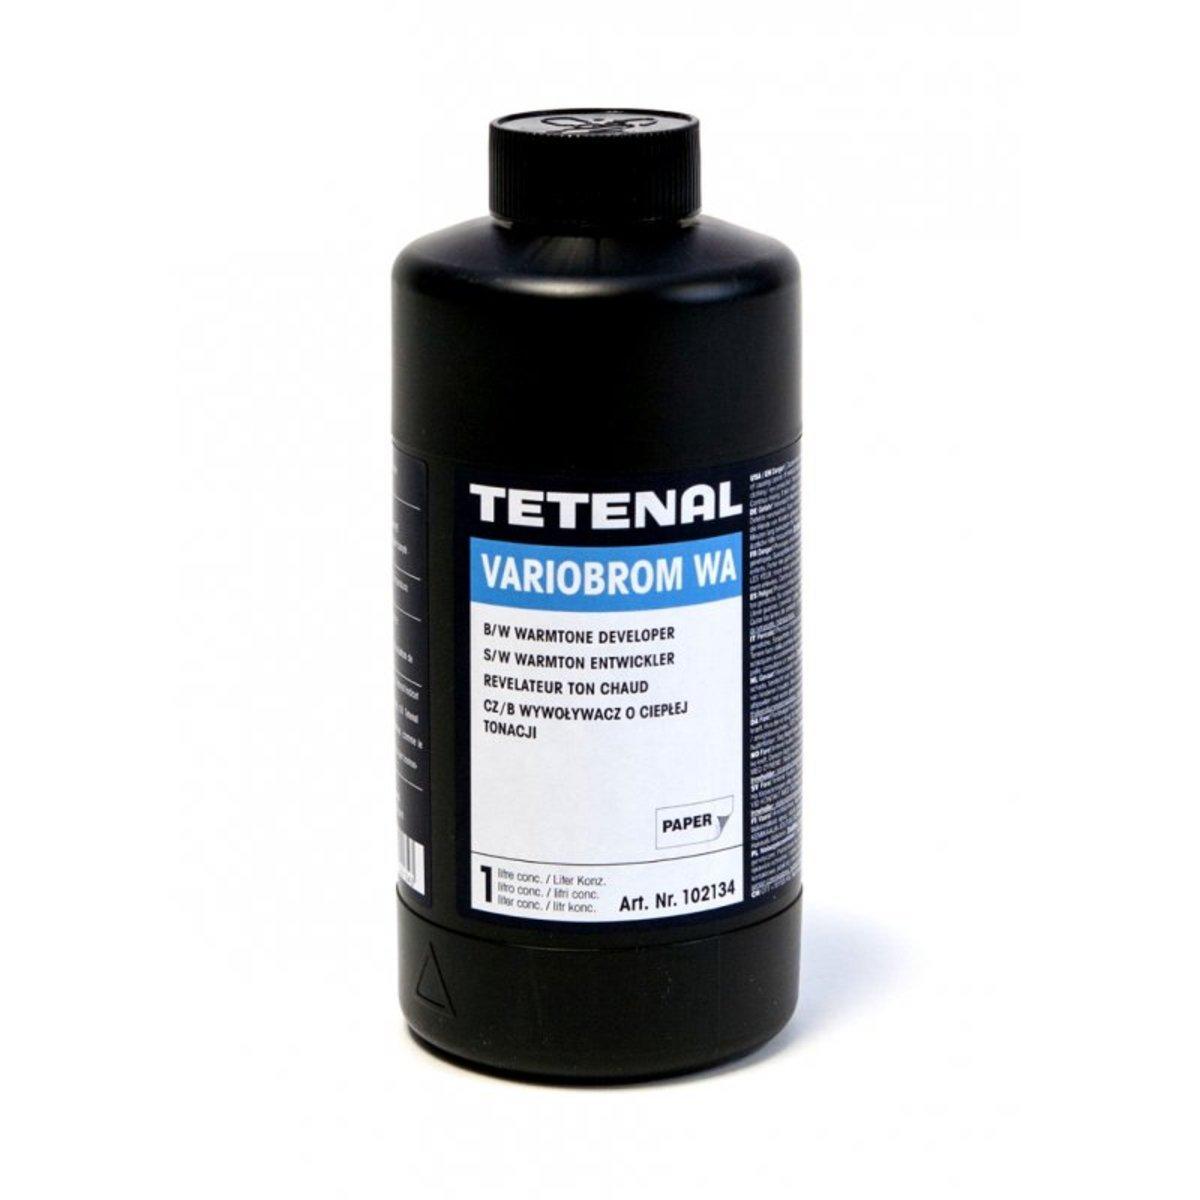 Variobrom WA 暖調相紙顯影劑